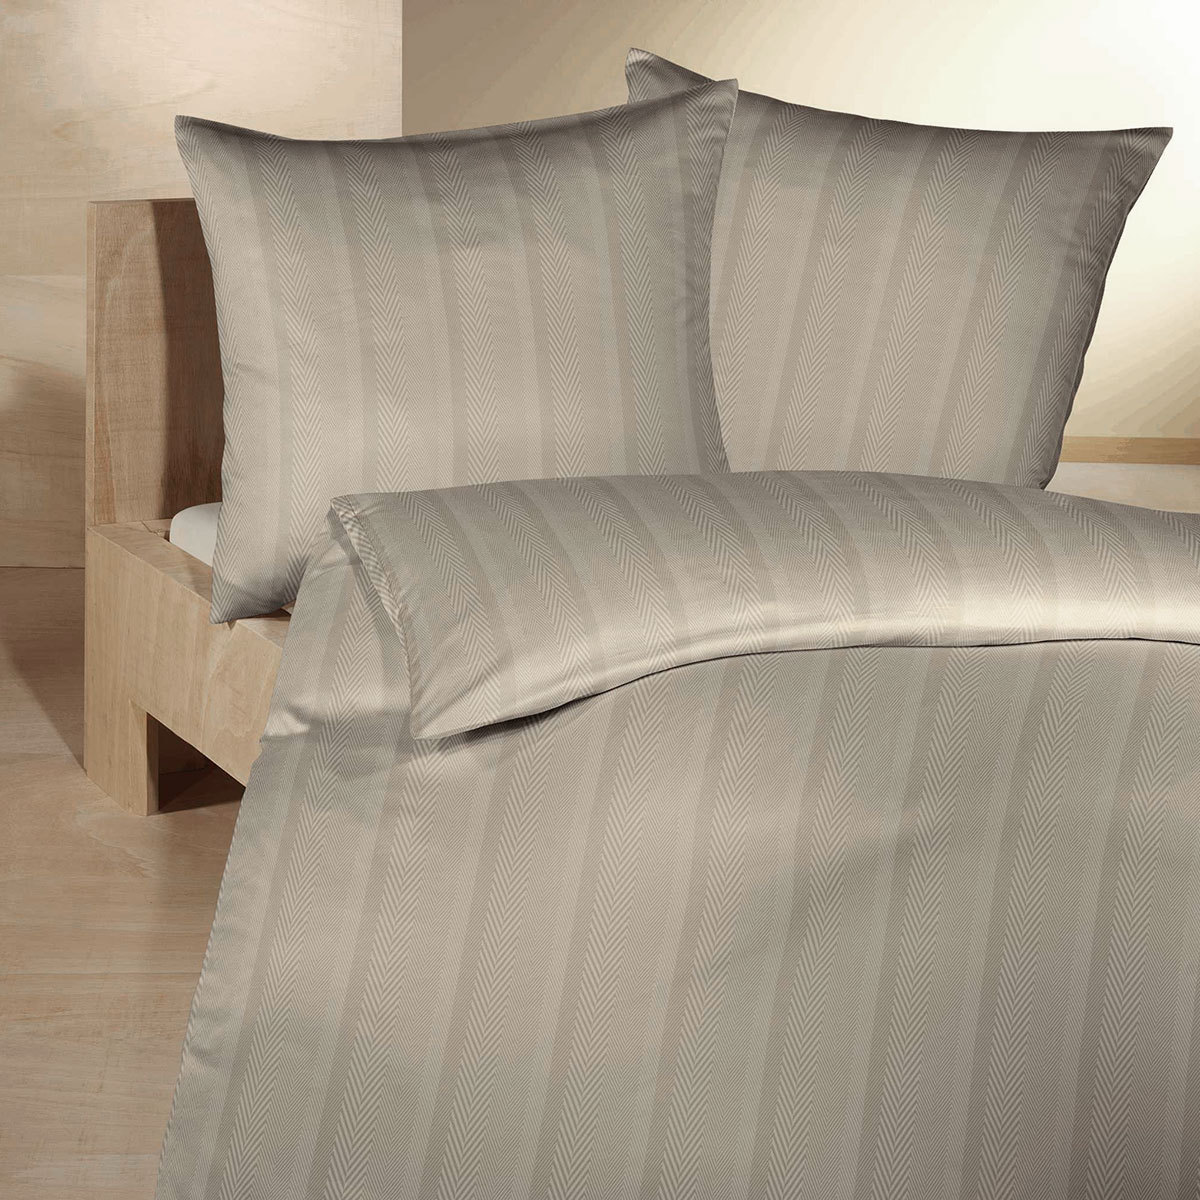 fleuresse mako brokat damast bettw sche jade 453556 8033 g nstig online kaufen bei bettwaren shop. Black Bedroom Furniture Sets. Home Design Ideas